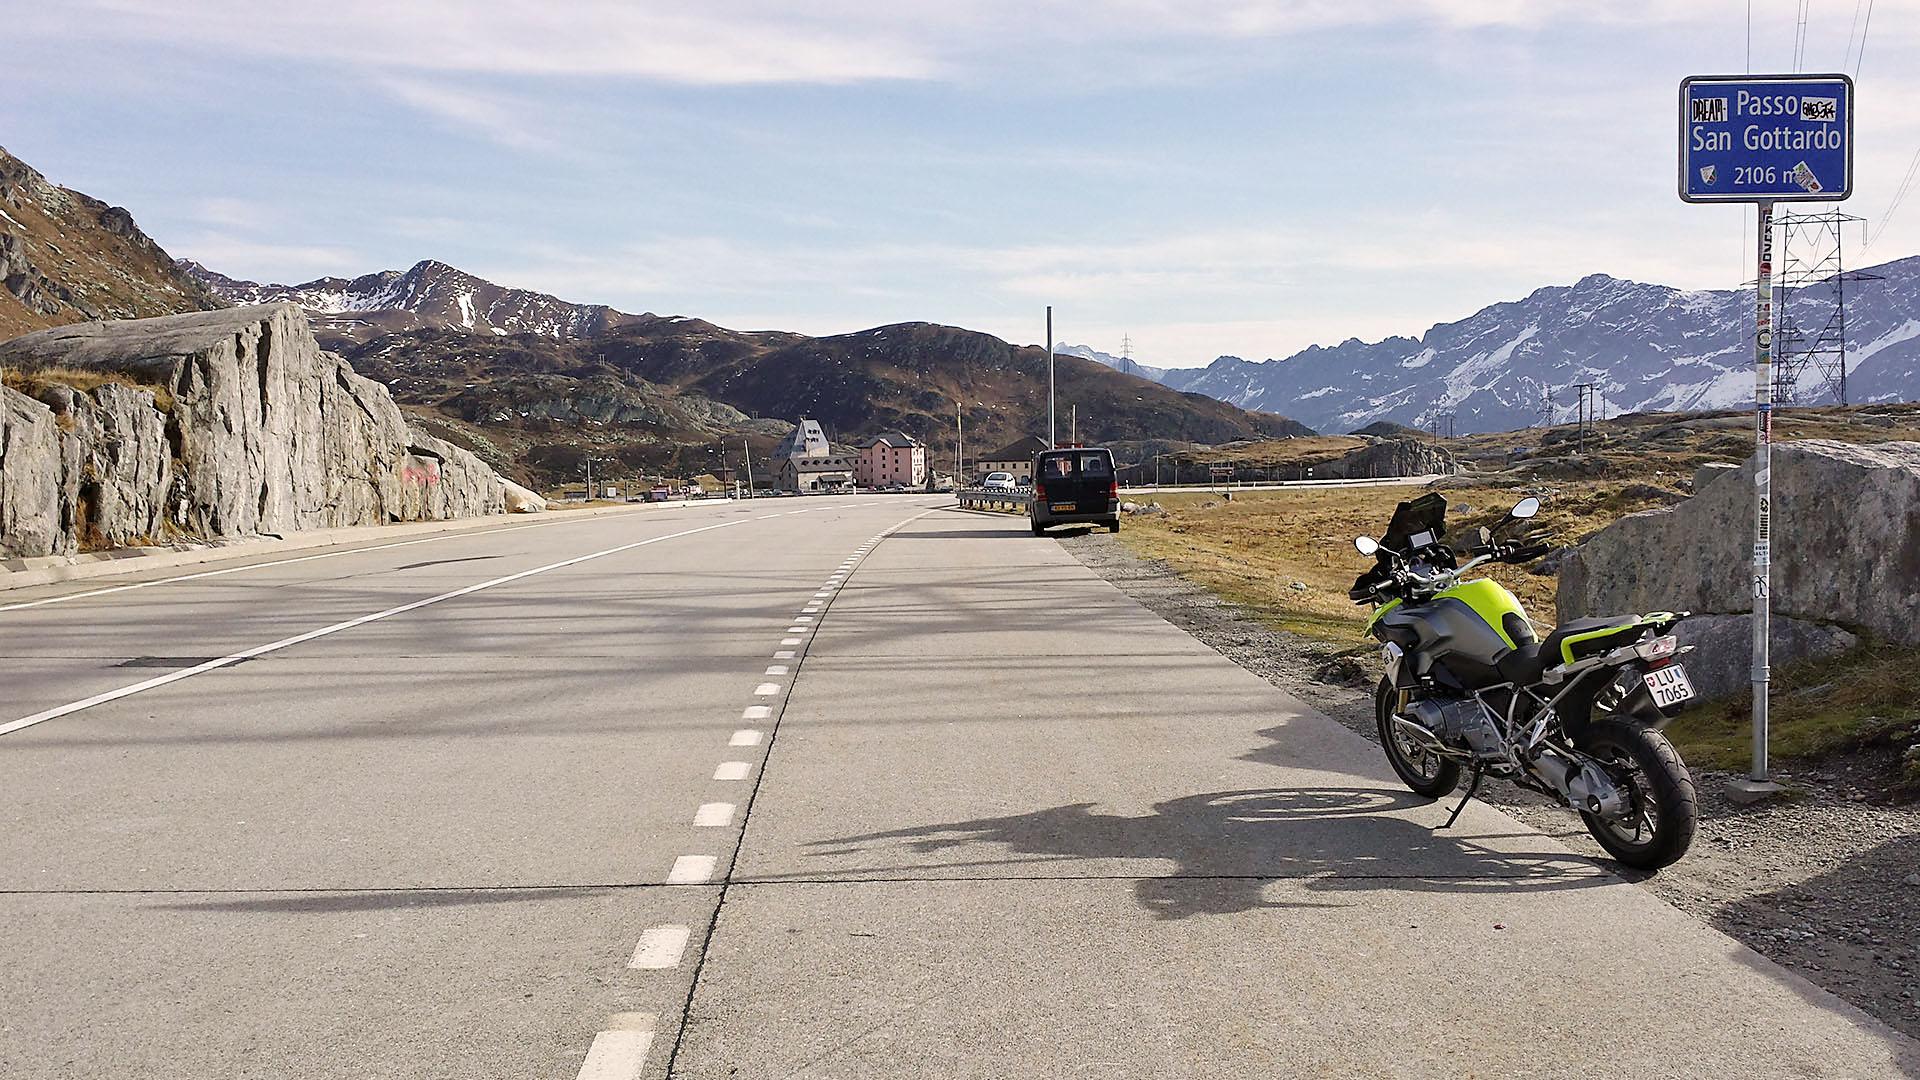 2106 - CH - Gotthard-Pass (Passo del San Gottardo) © Pässe.Info